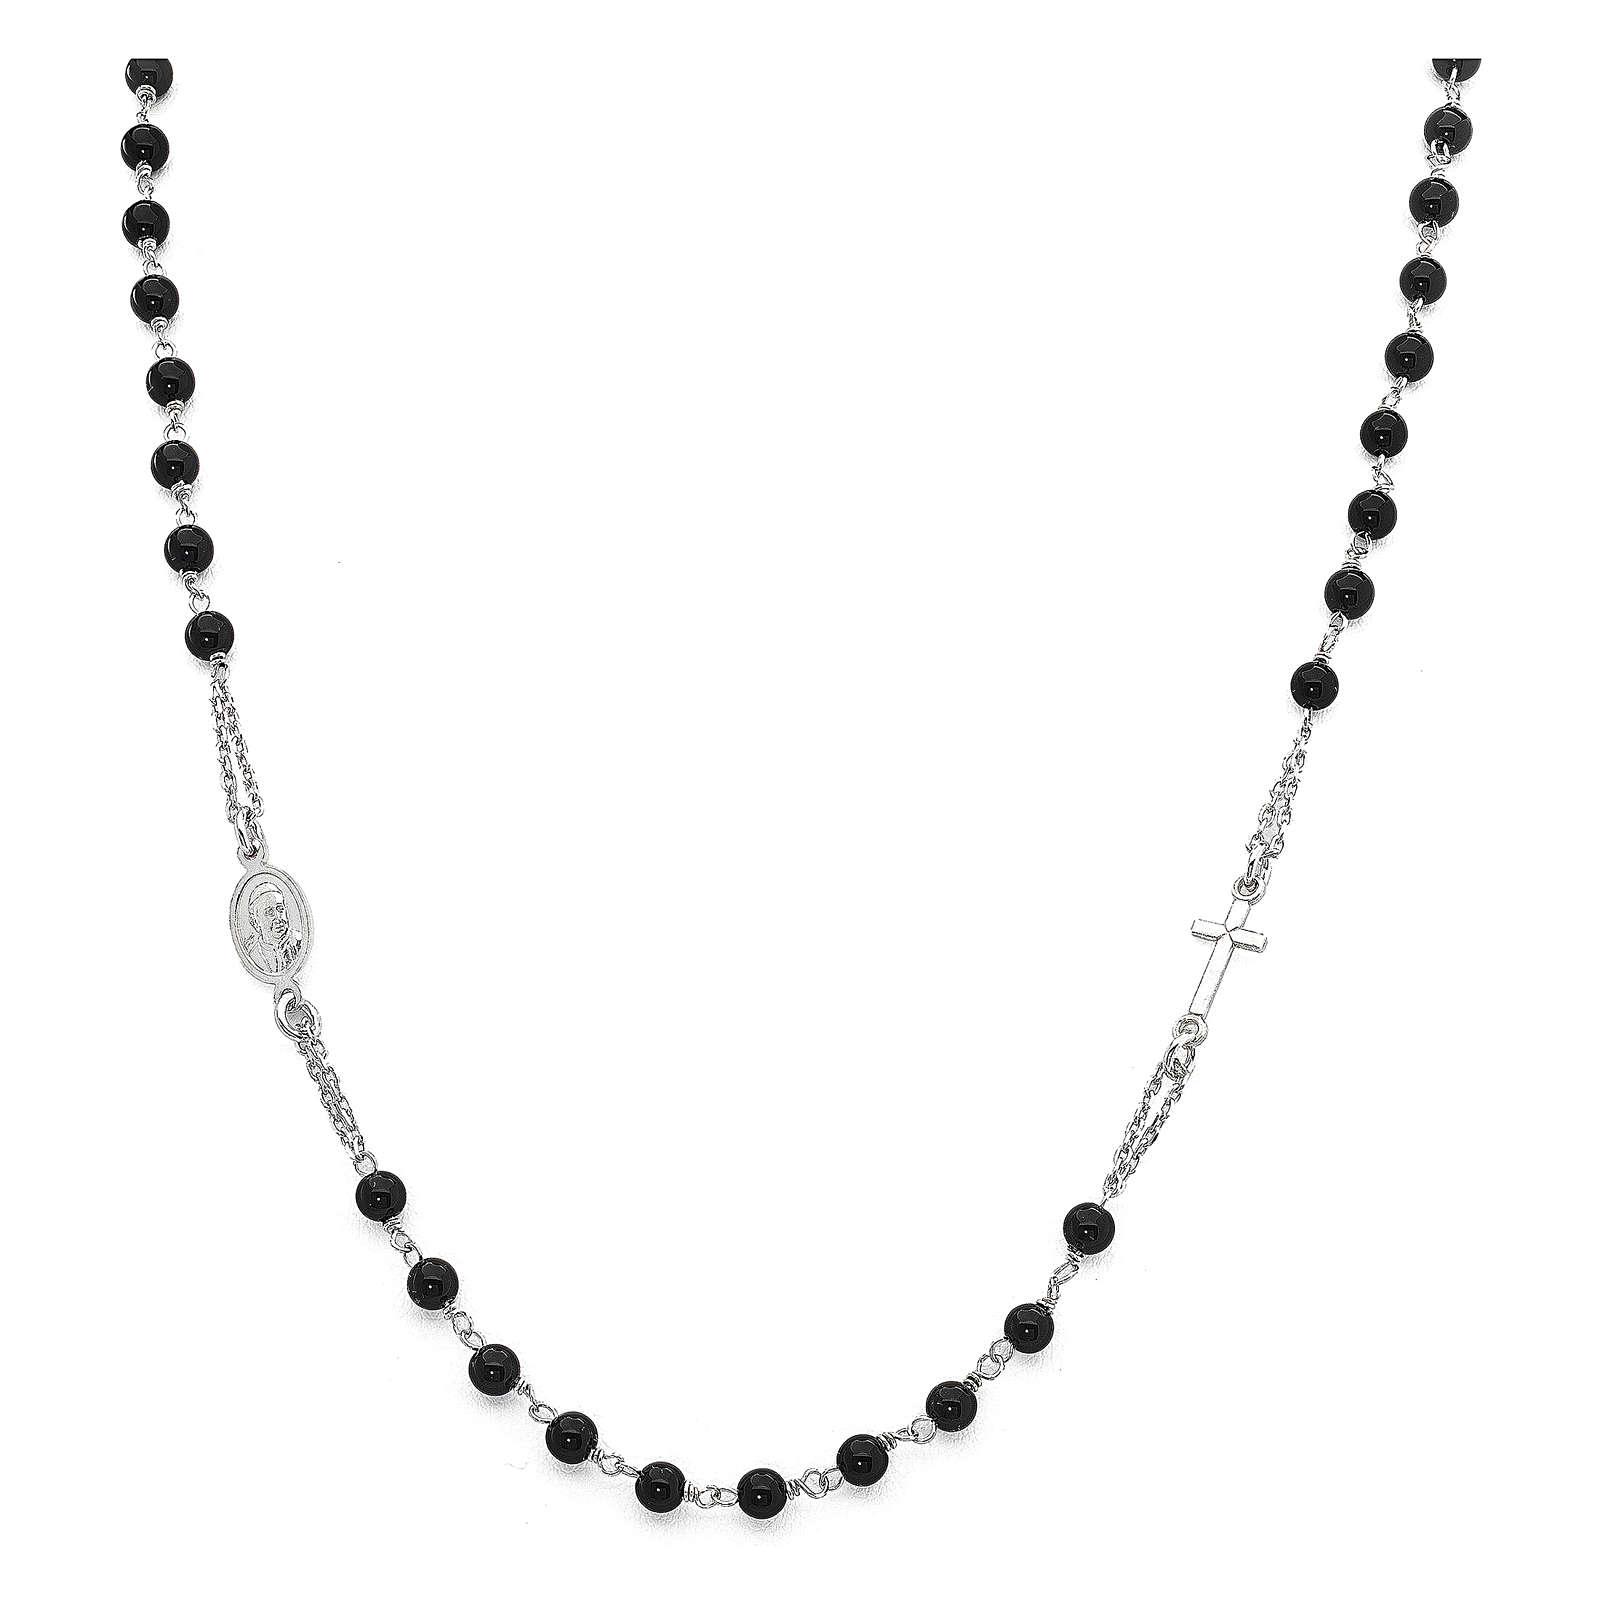 Colar terço gargantilha AMEN cristais pretos prata 925 acab. radiado 4